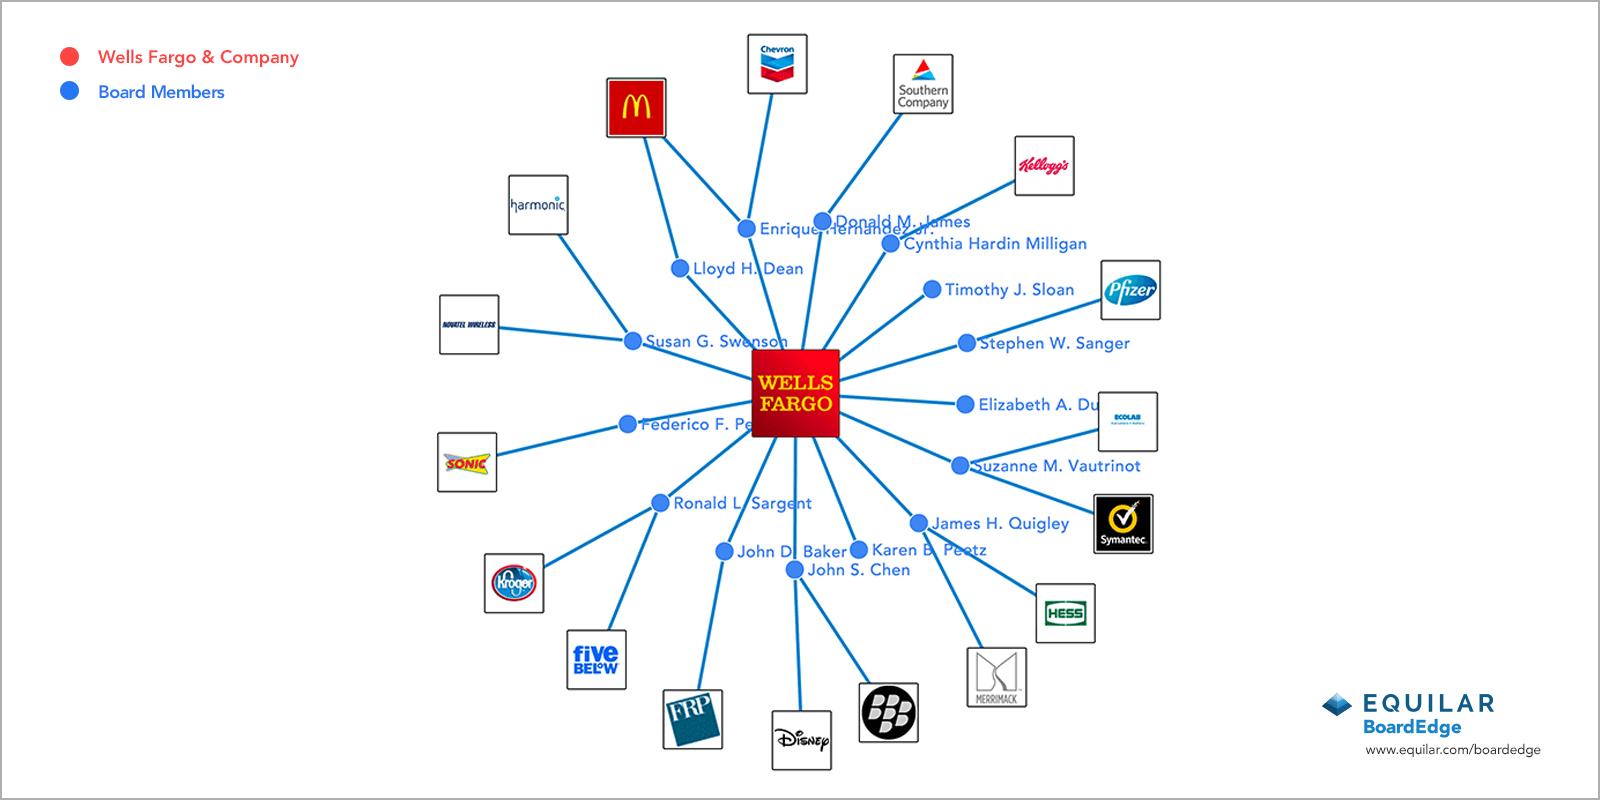 wells fargo organizational structure